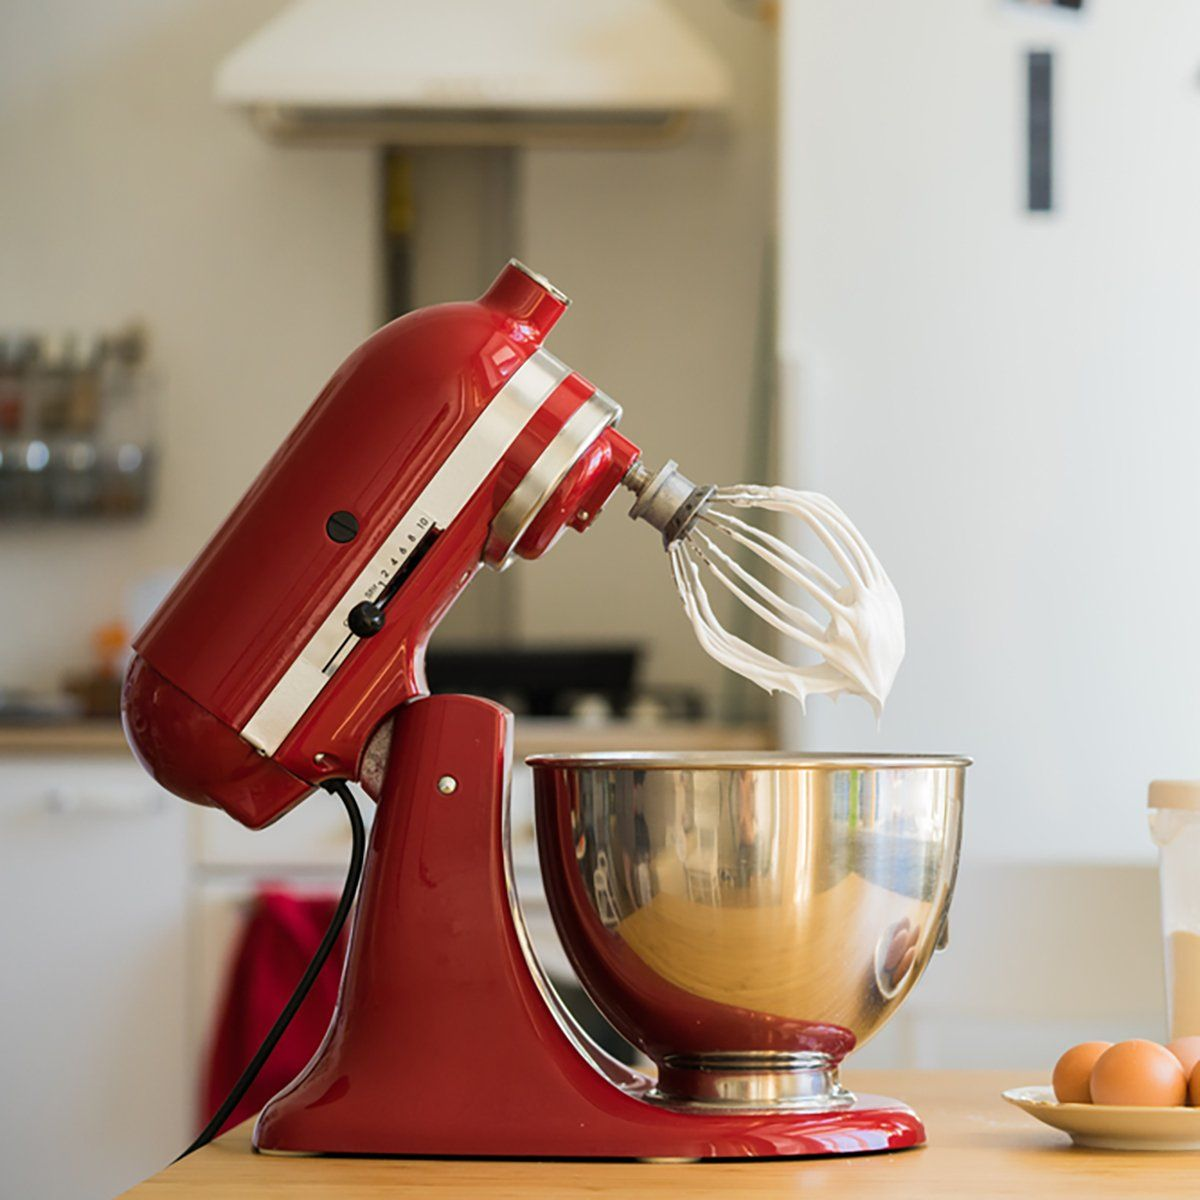 8 kitchenaid mixer mistakes everyones made kitchen aid